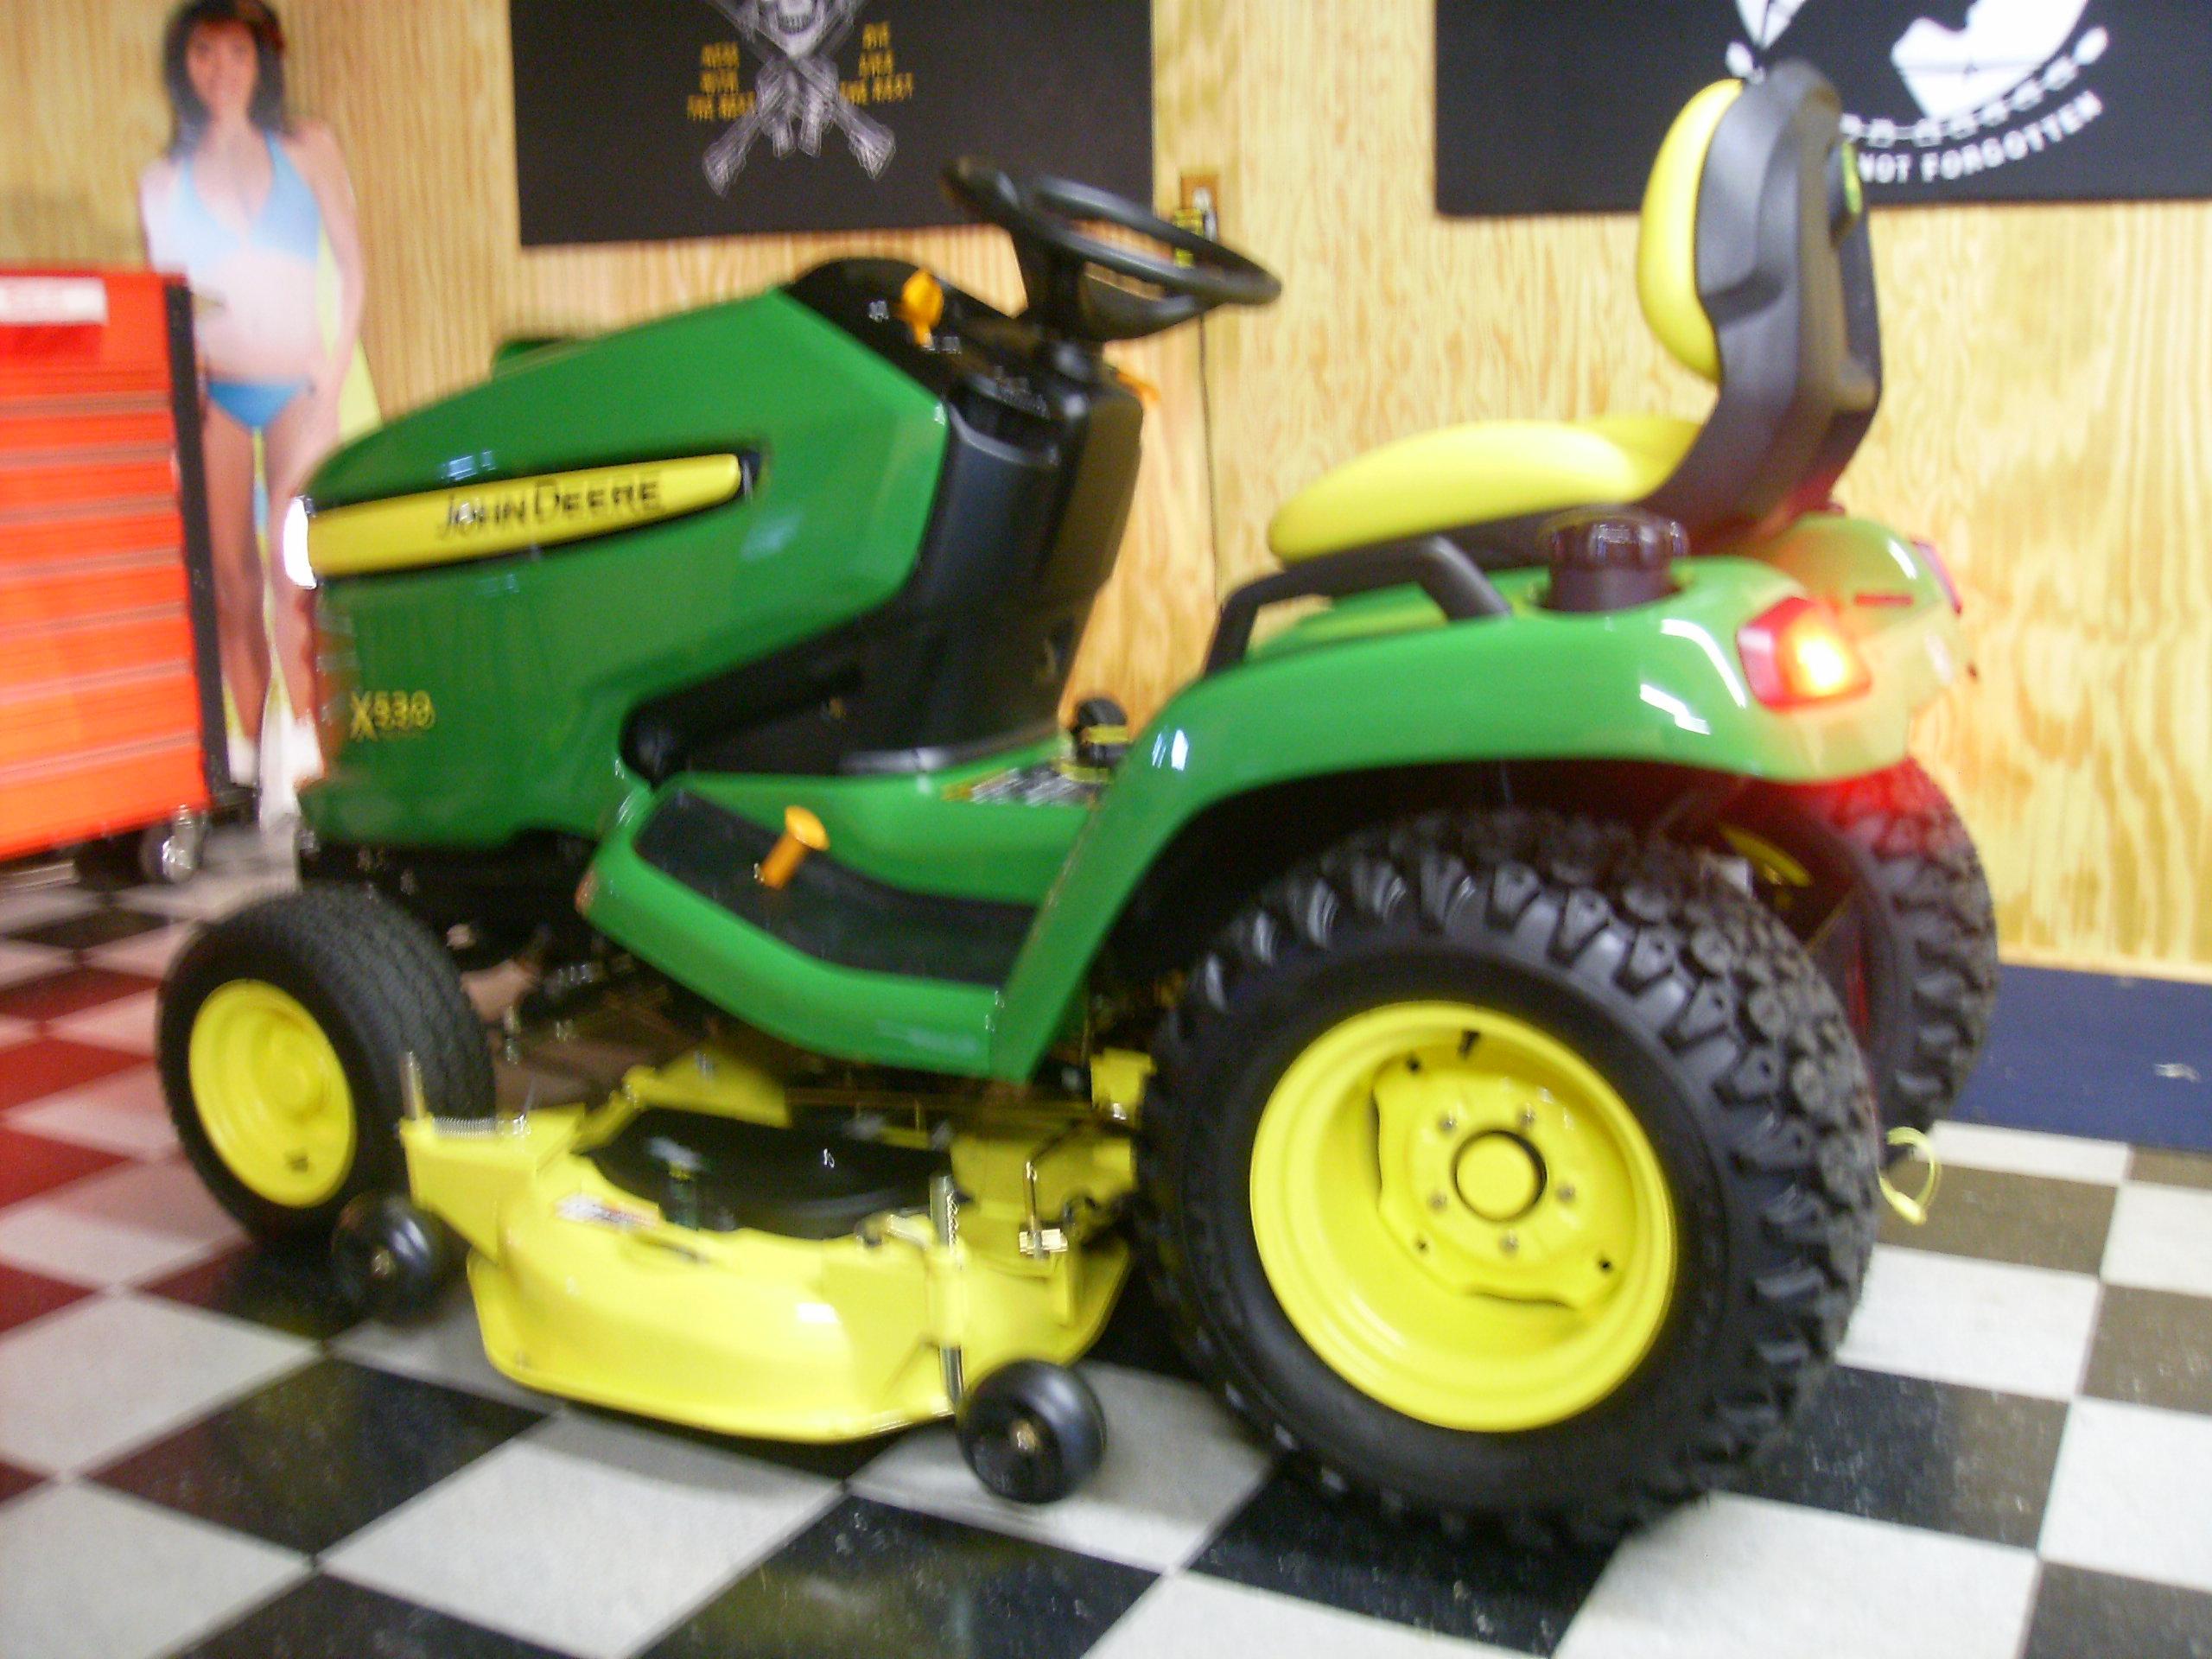 John Deere 530 Photo Gallery - TractorByNet.com